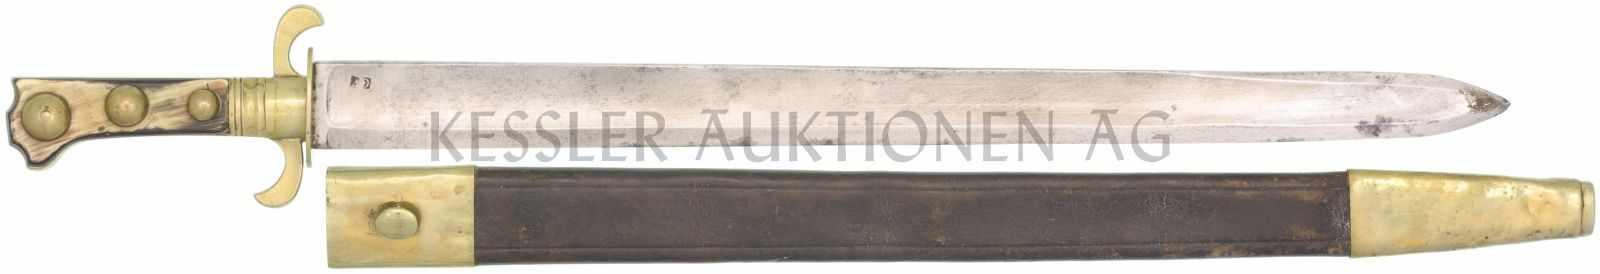 Waidmesser, Kt. VD, 1830 KL 513mm, TL 640mm, Klinge mit voller Wurzel, beidseitiger Hohlschliff,